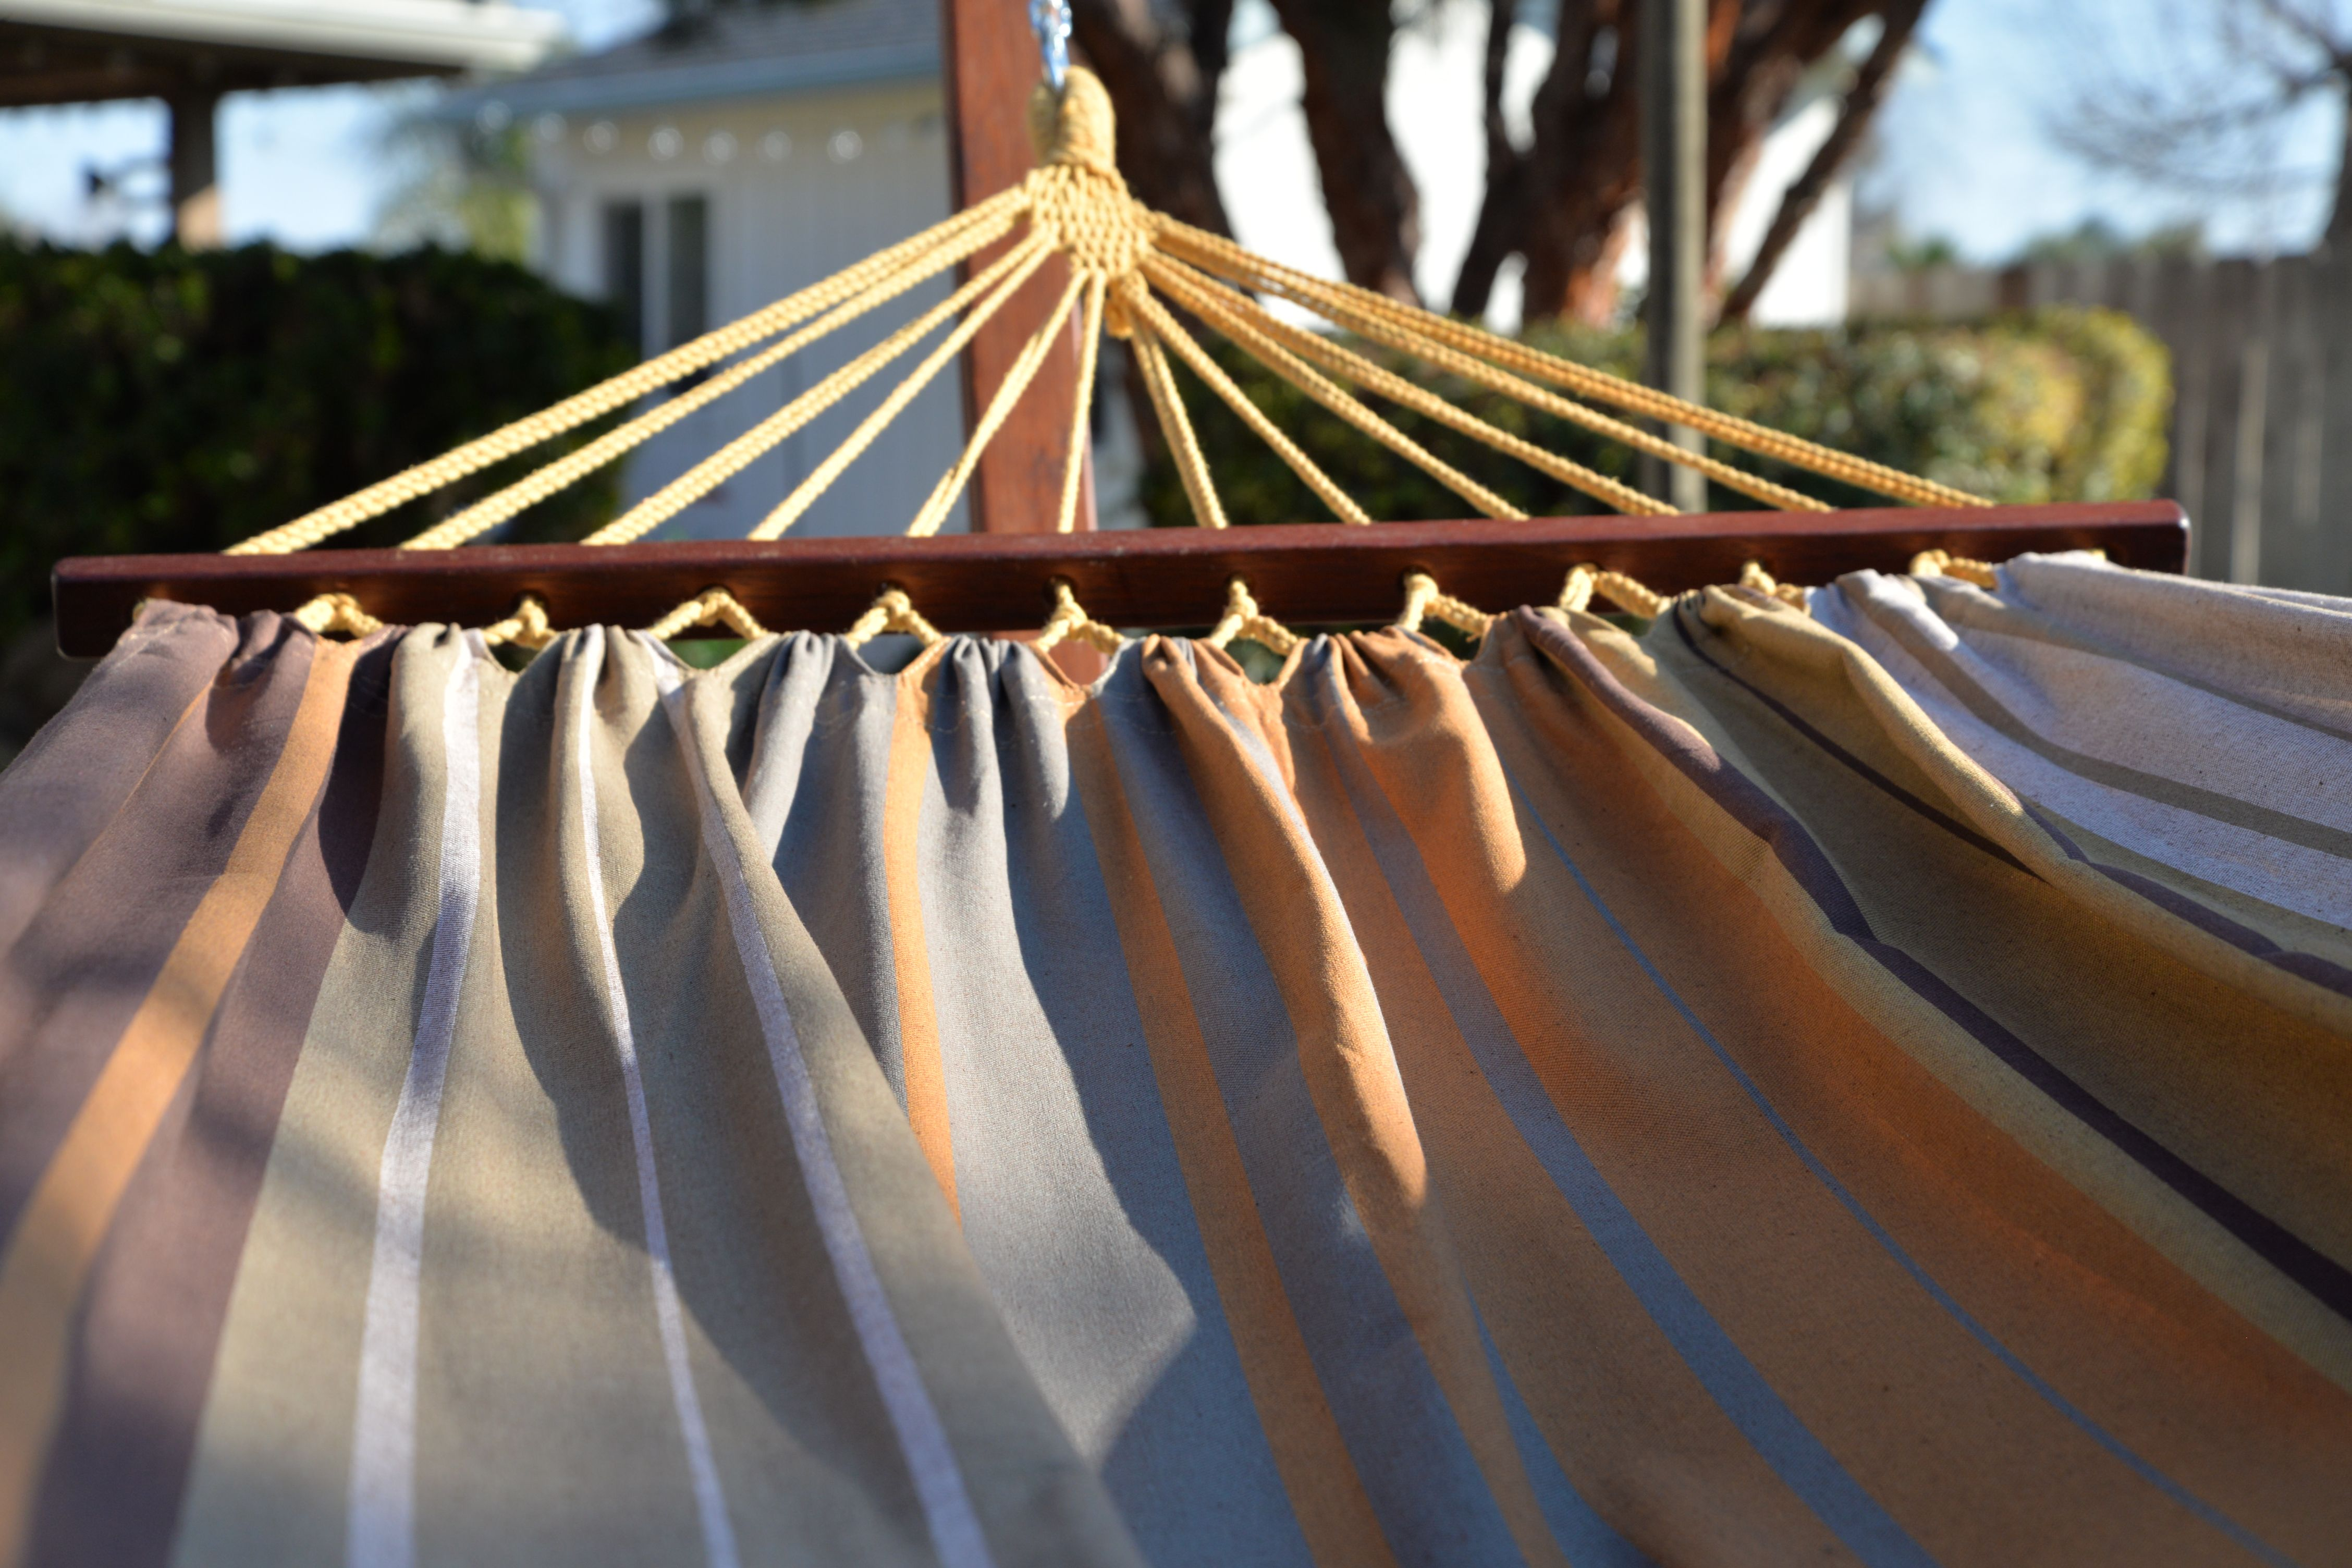 Handcrafted Polyester Ropes Provide The Combo With Weight Capacity Of 275 Lbs Patio Lawn Garden Hammocks Hammock Diy Hammock Backyard Hammock